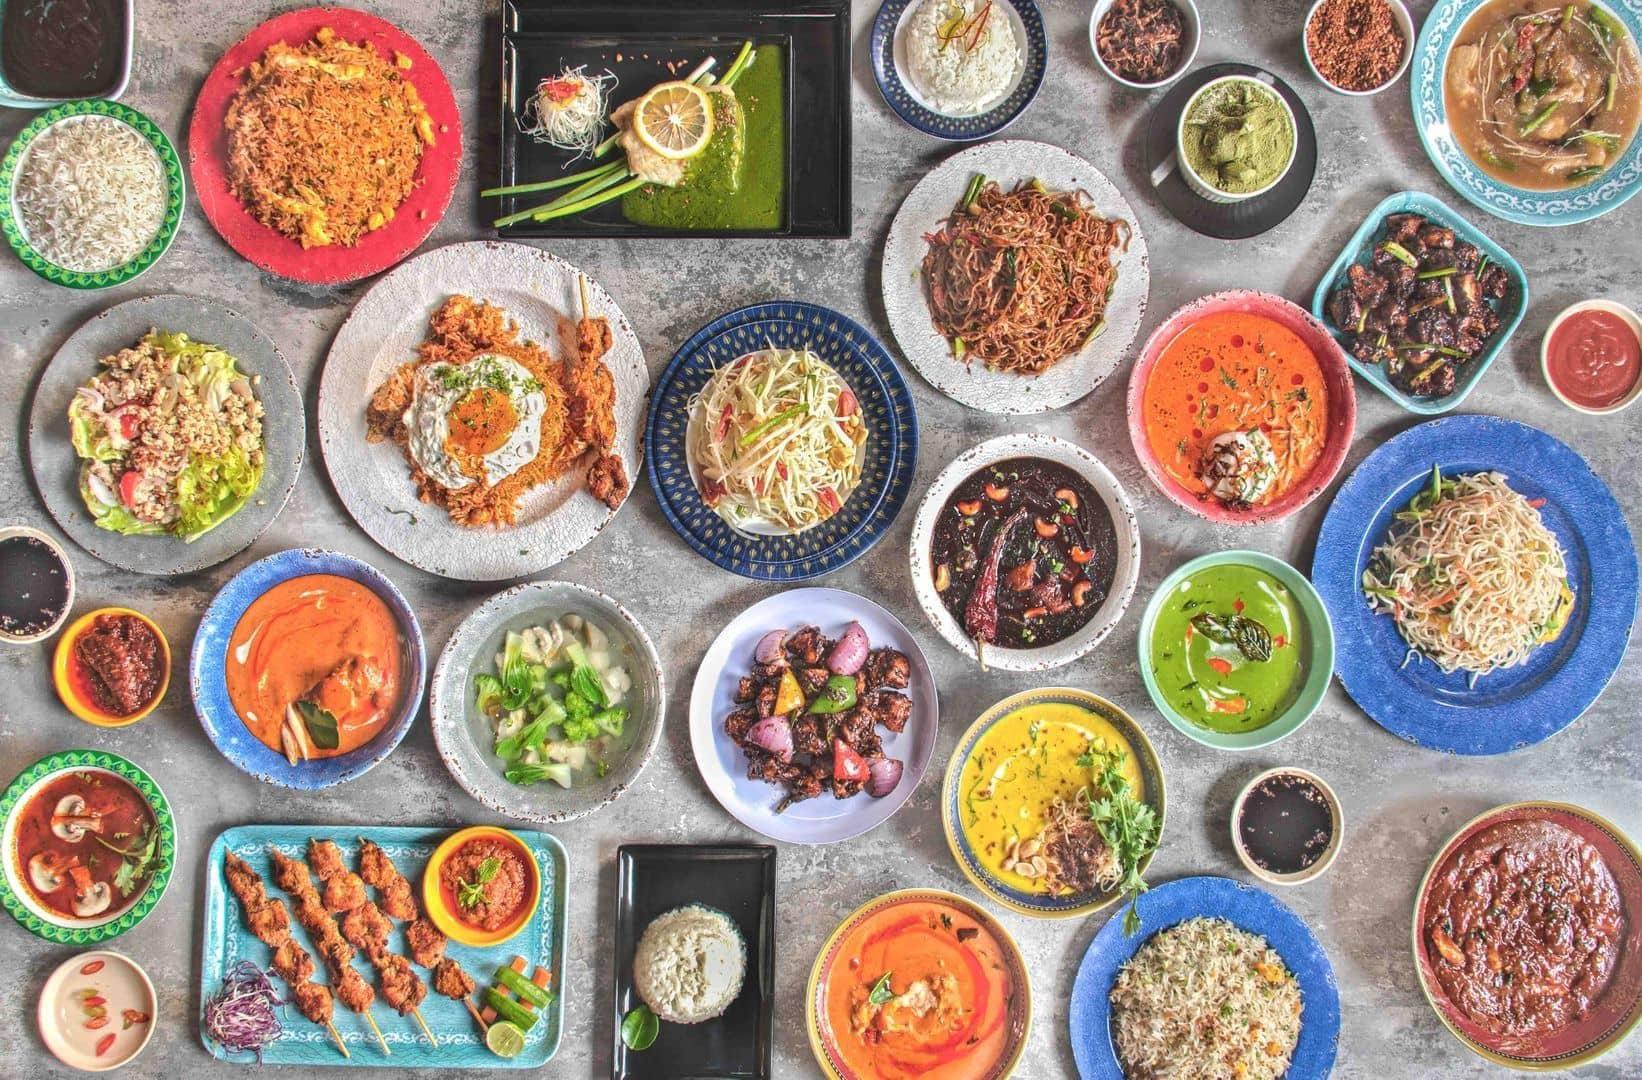 Canteen Asia image